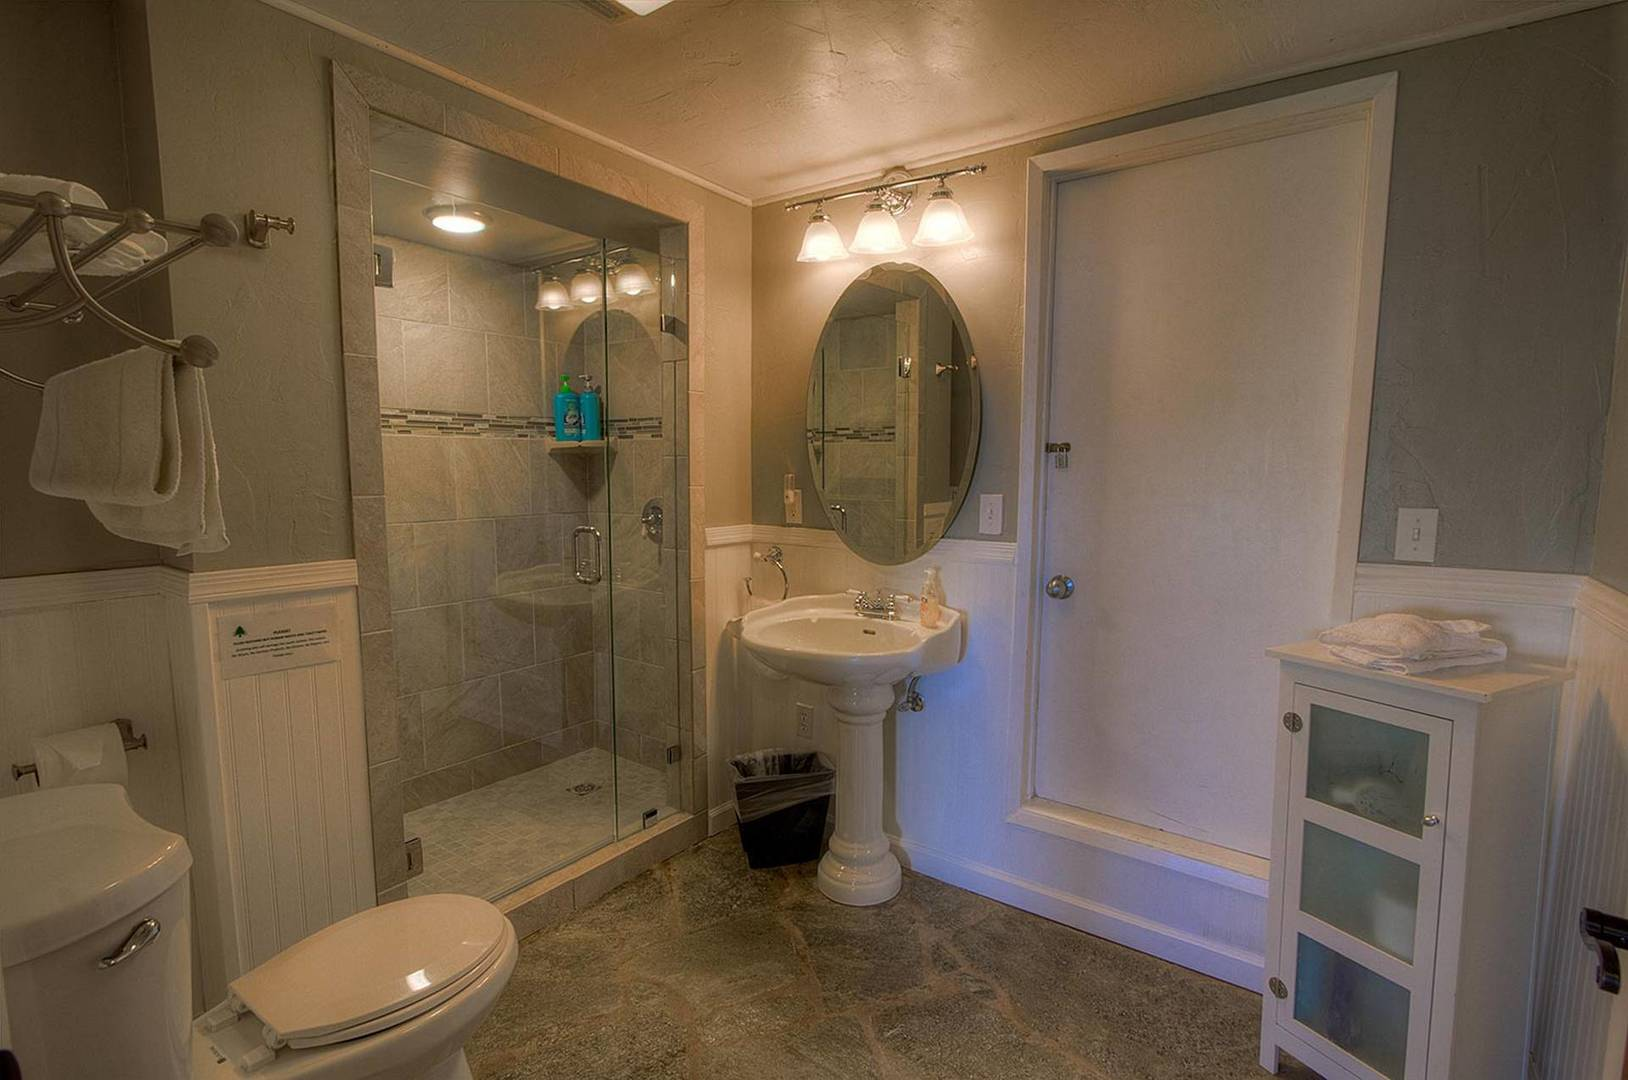 ivh1810 bathroom